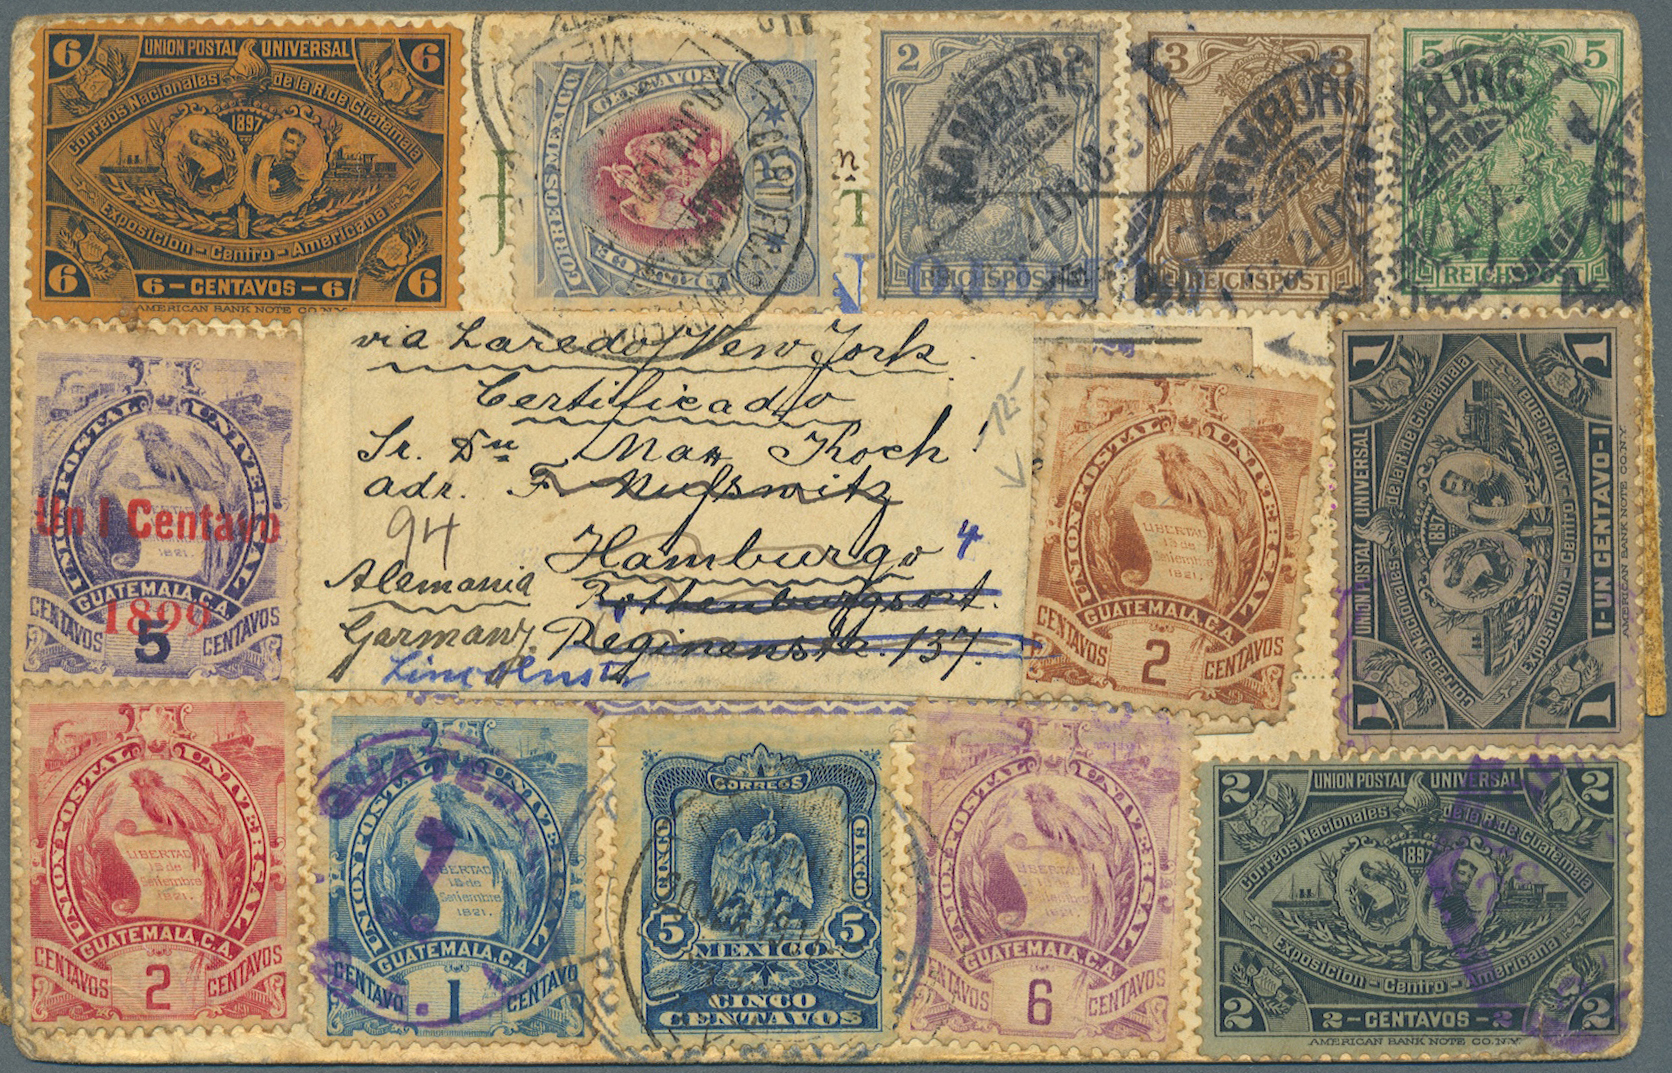 Lot 13826 - guatemala  -  Auktionshaus Christoph Gärtner GmbH & Co. KG Single lots Philately Overseas & Europe. Auction #39 Day 4